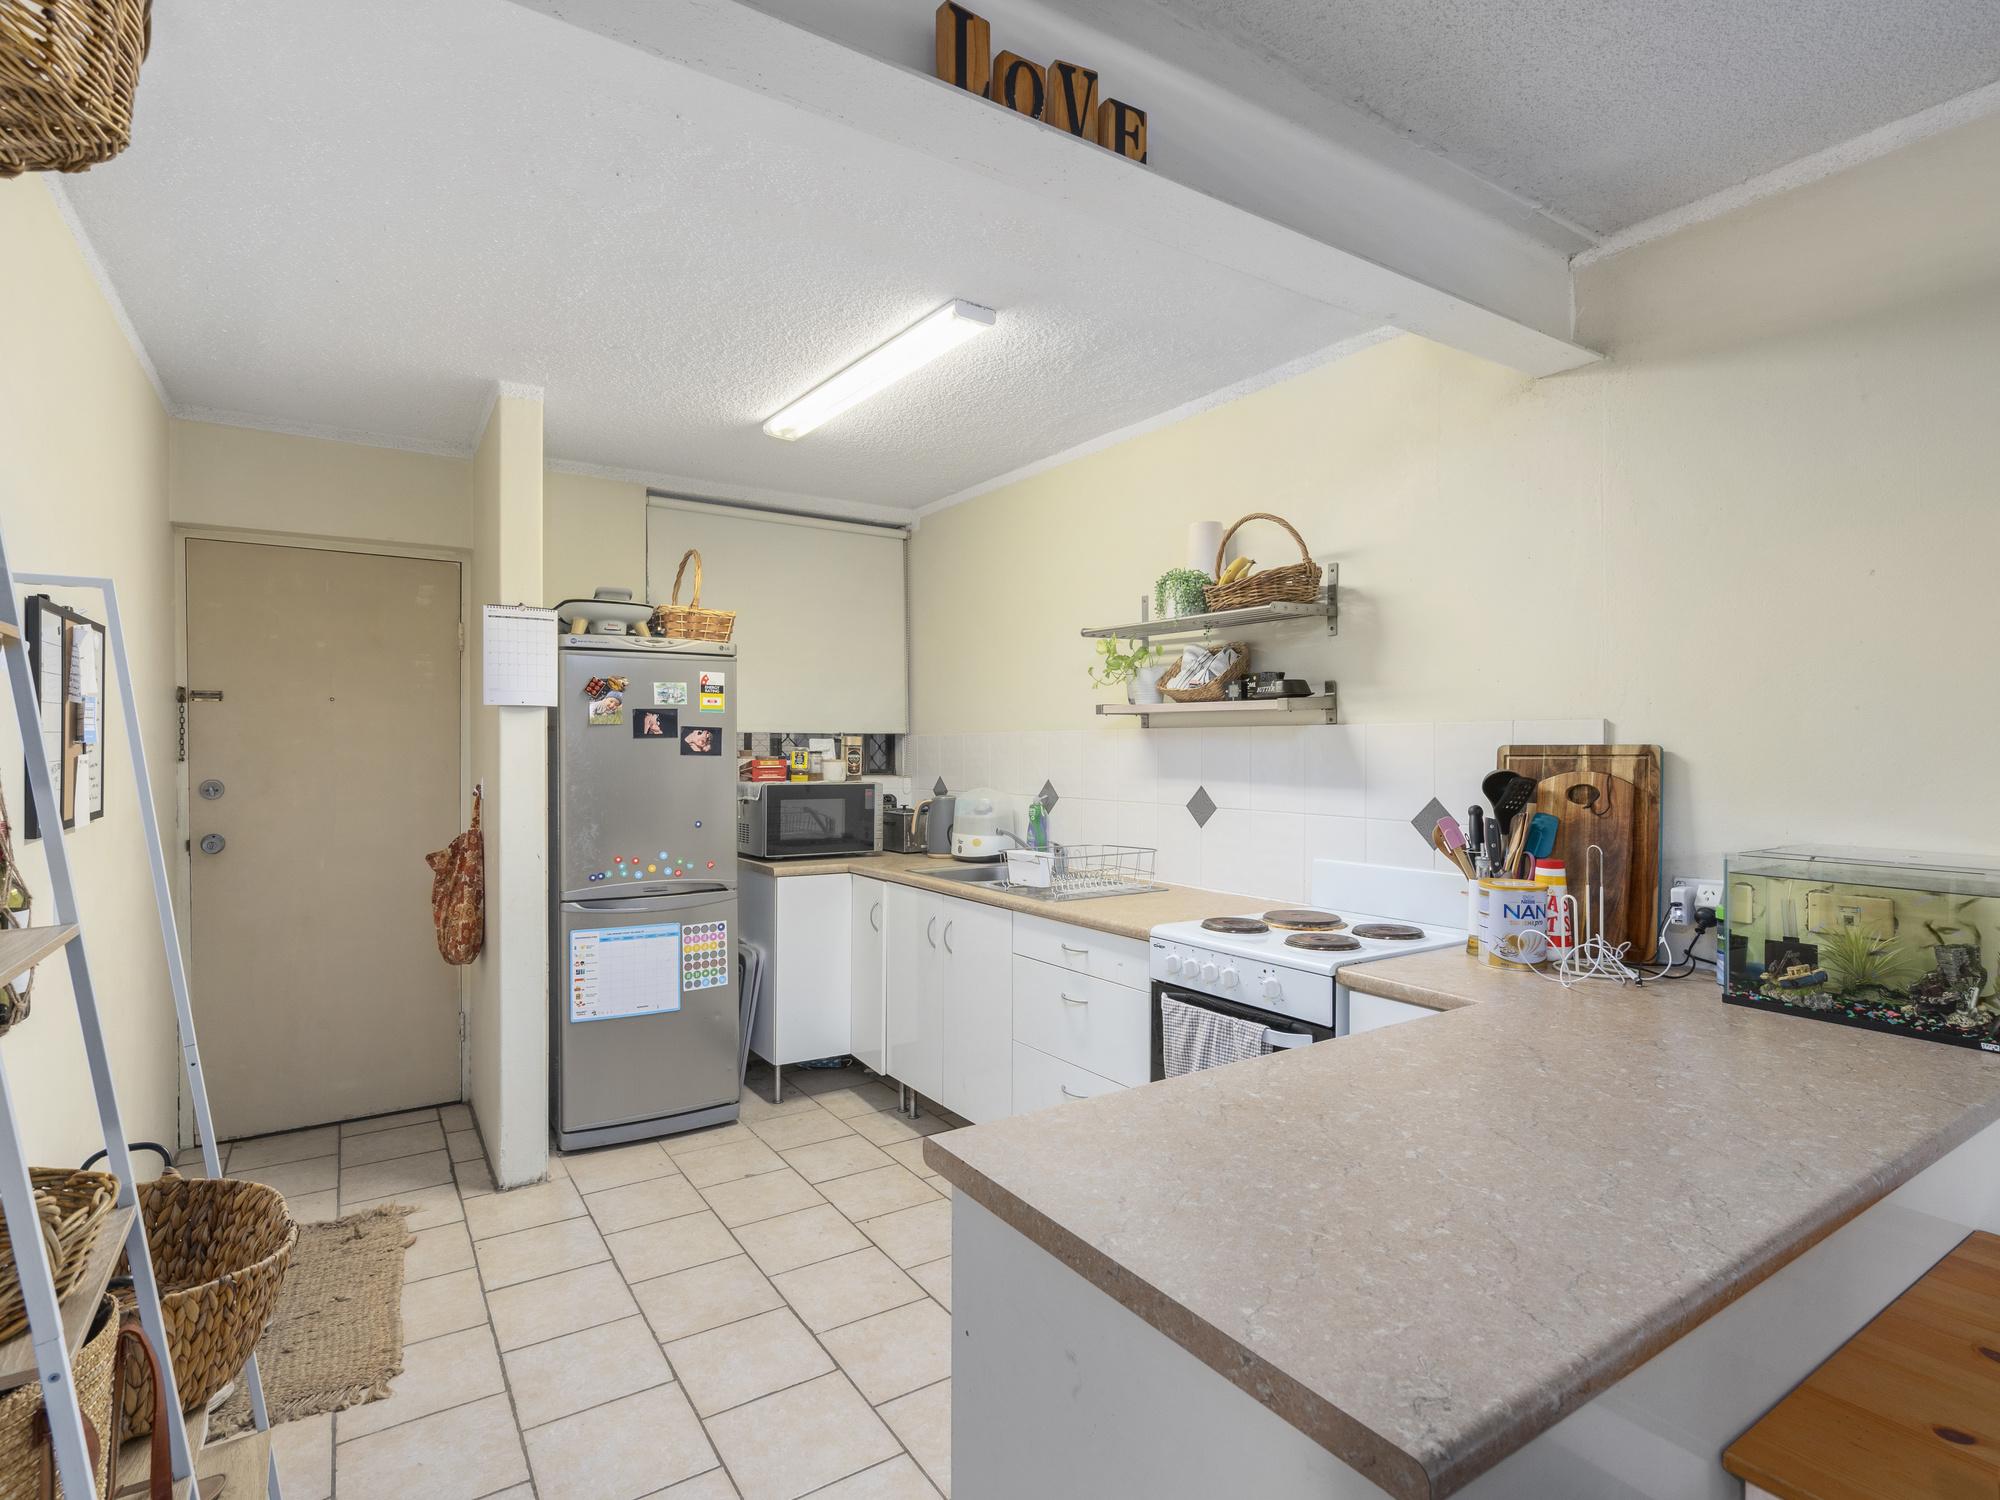 Real Estate | Gold Coast | Chevron Realty | 002 Open2view Id698602 2 33 Darrambal Street